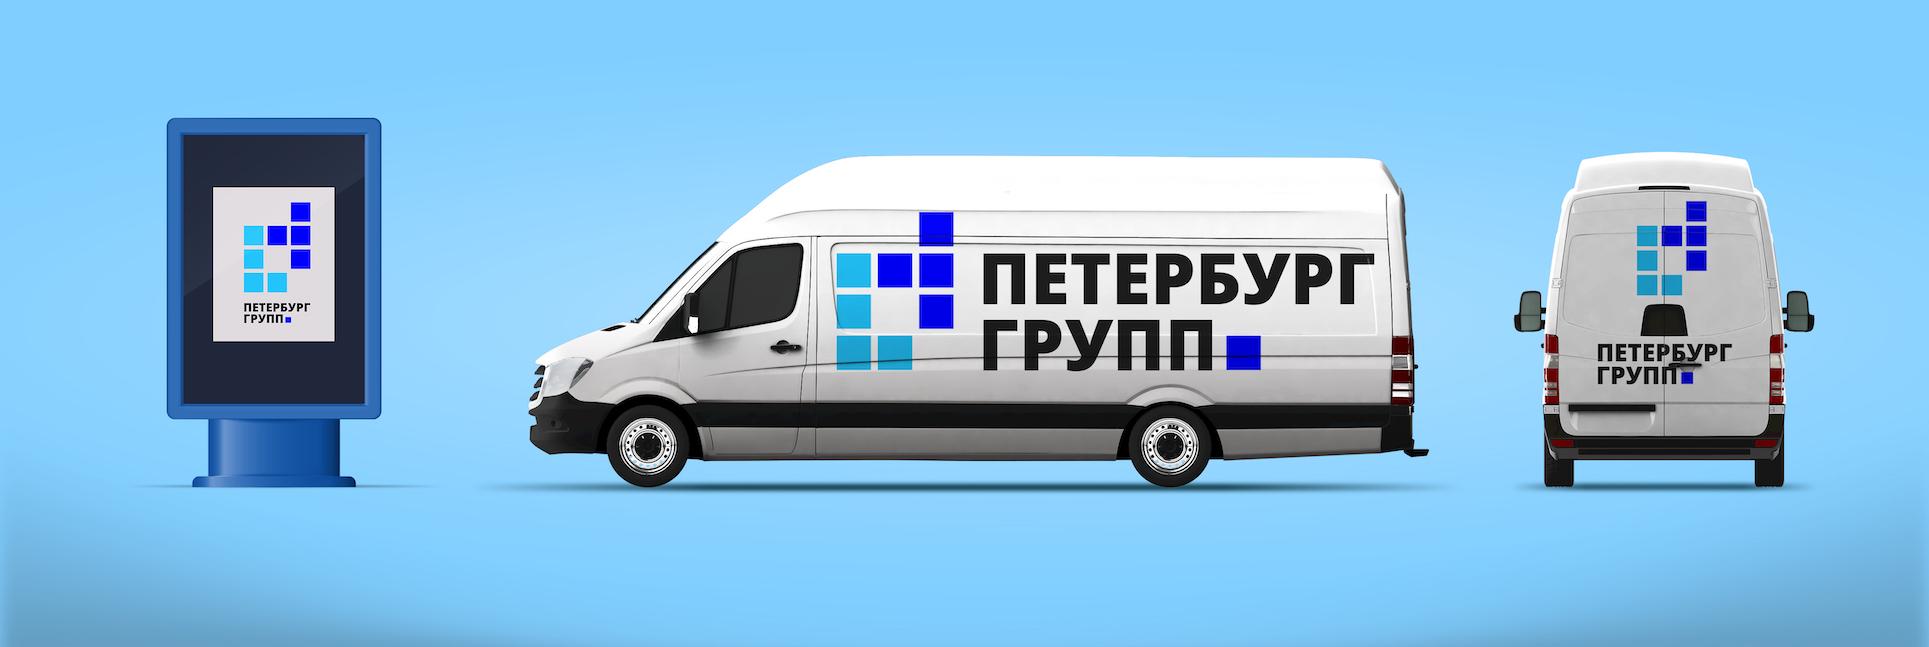 Петербург групп